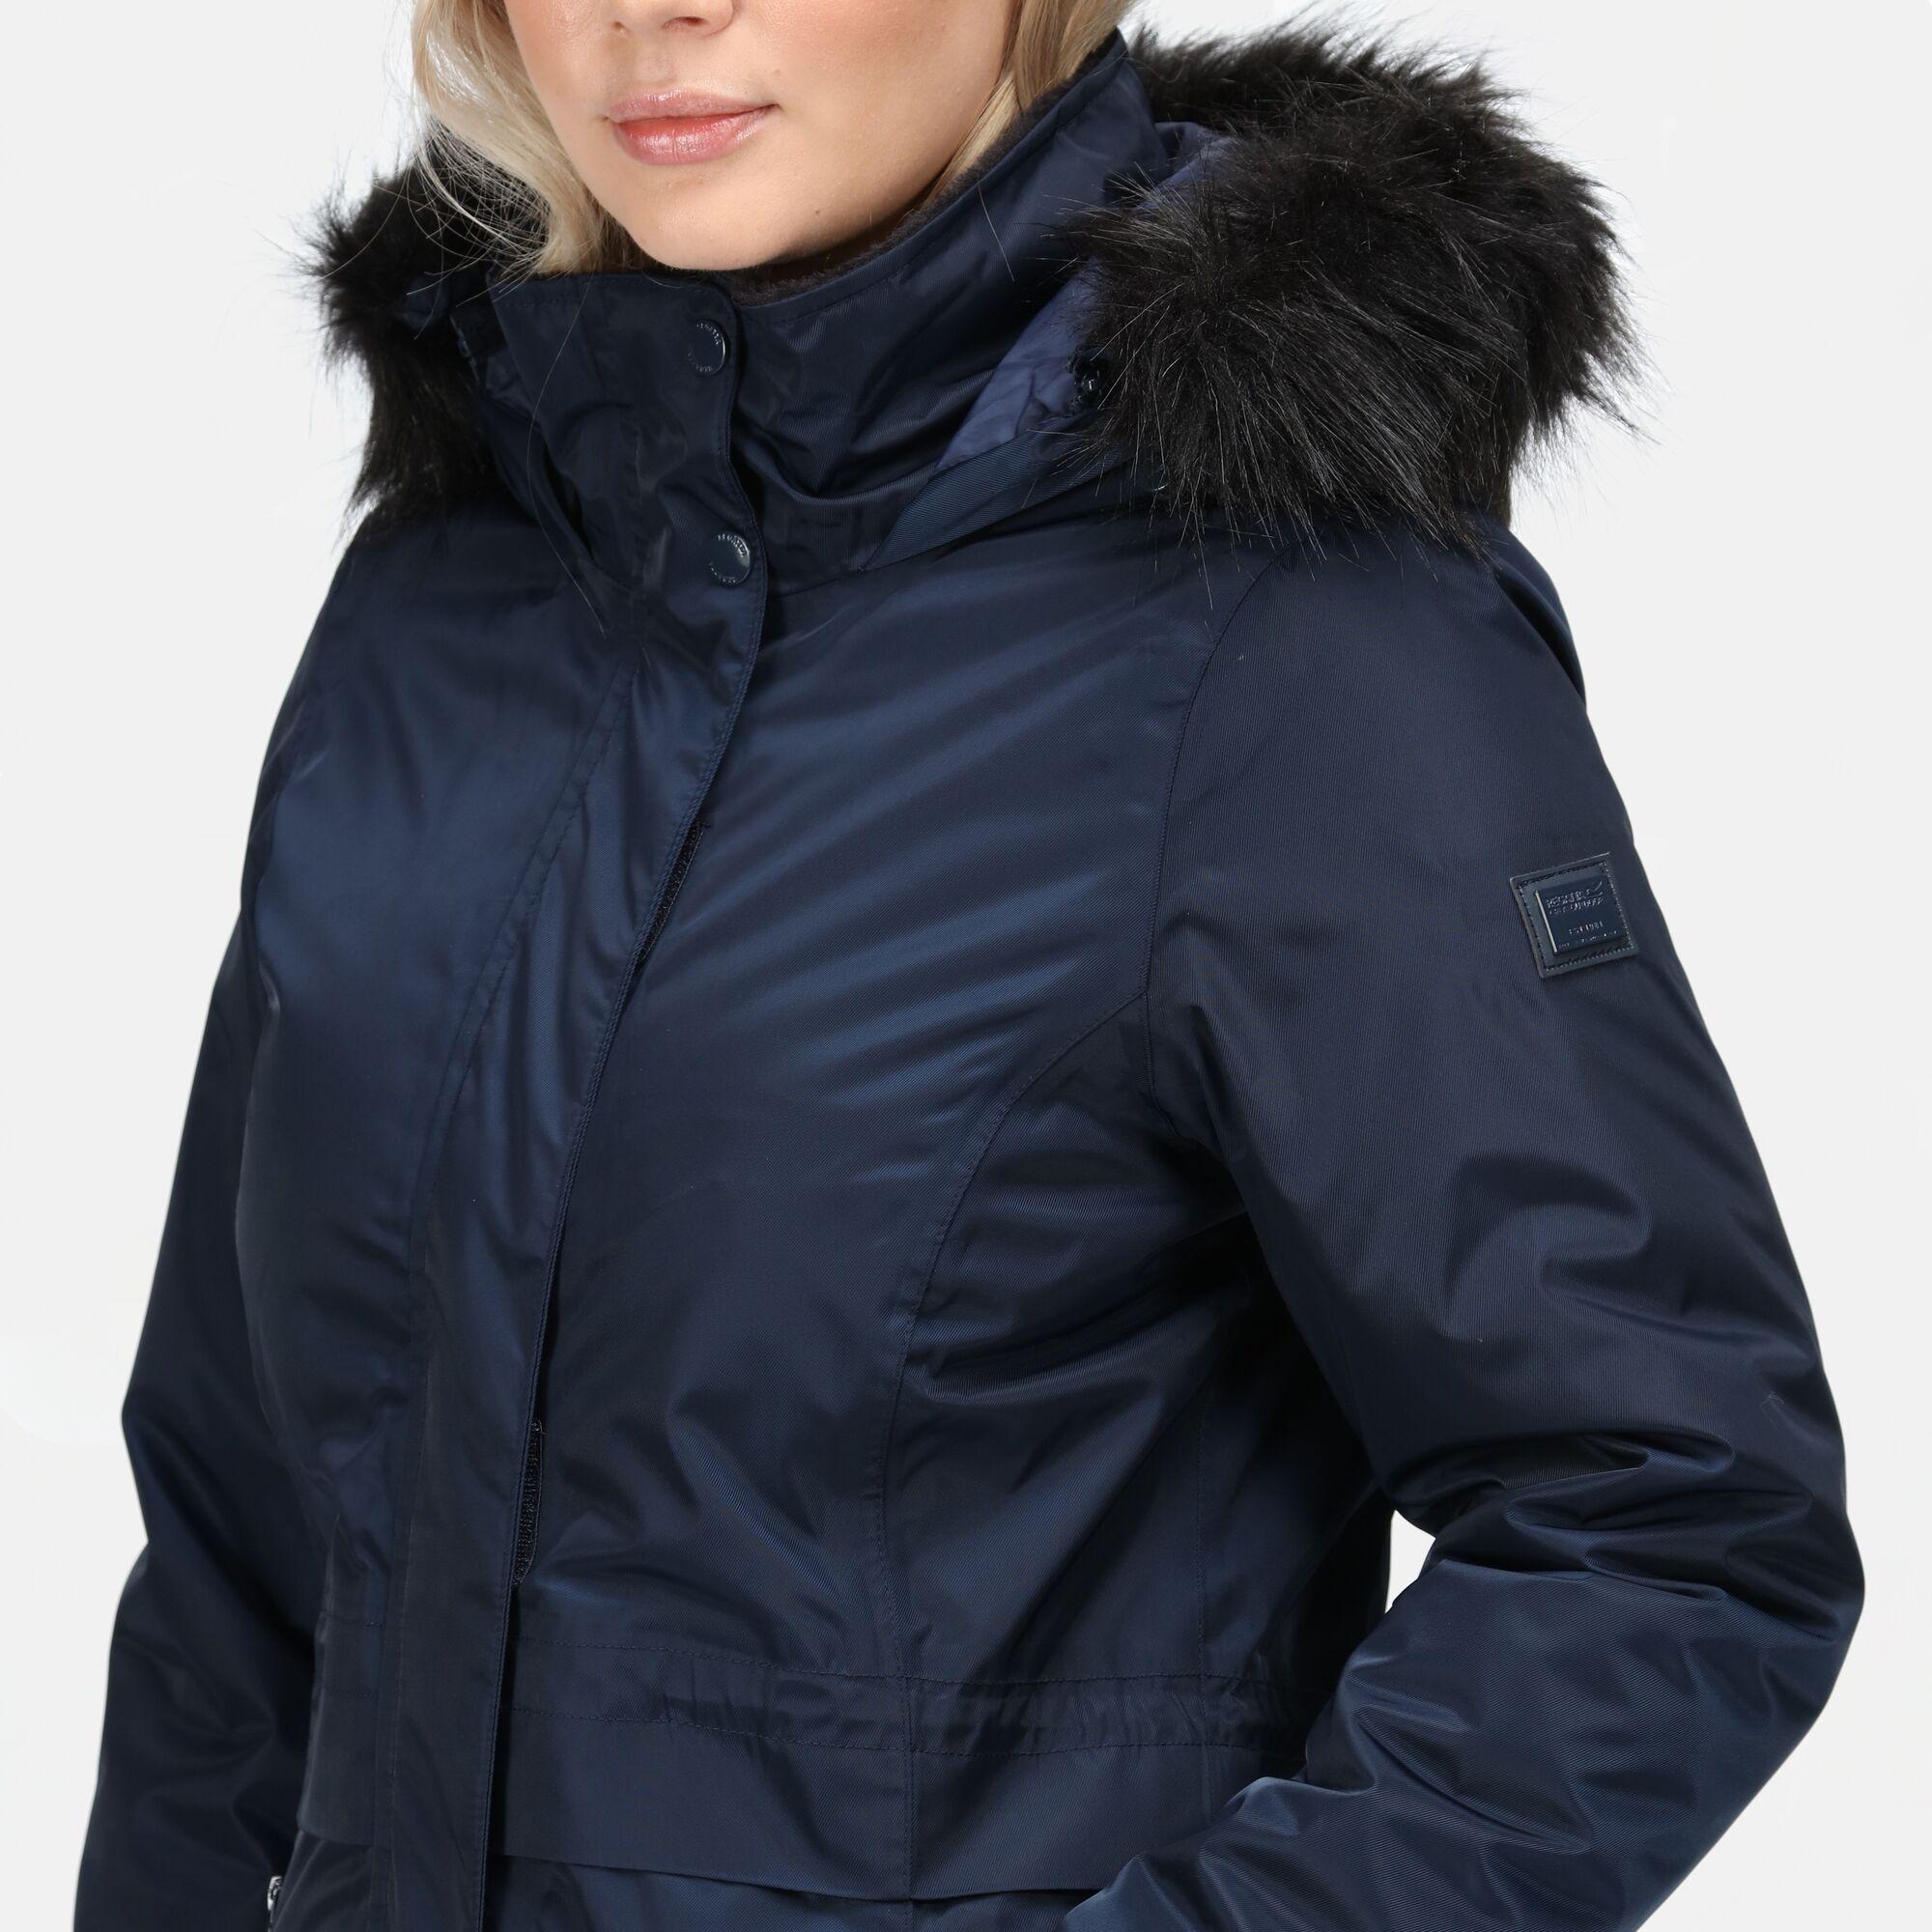 Regatta-Womens-Lexis-Waterproof-Insulated-Fur-Trim-Hood-Parka-Jacket-Blue-Navy thumbnail 10